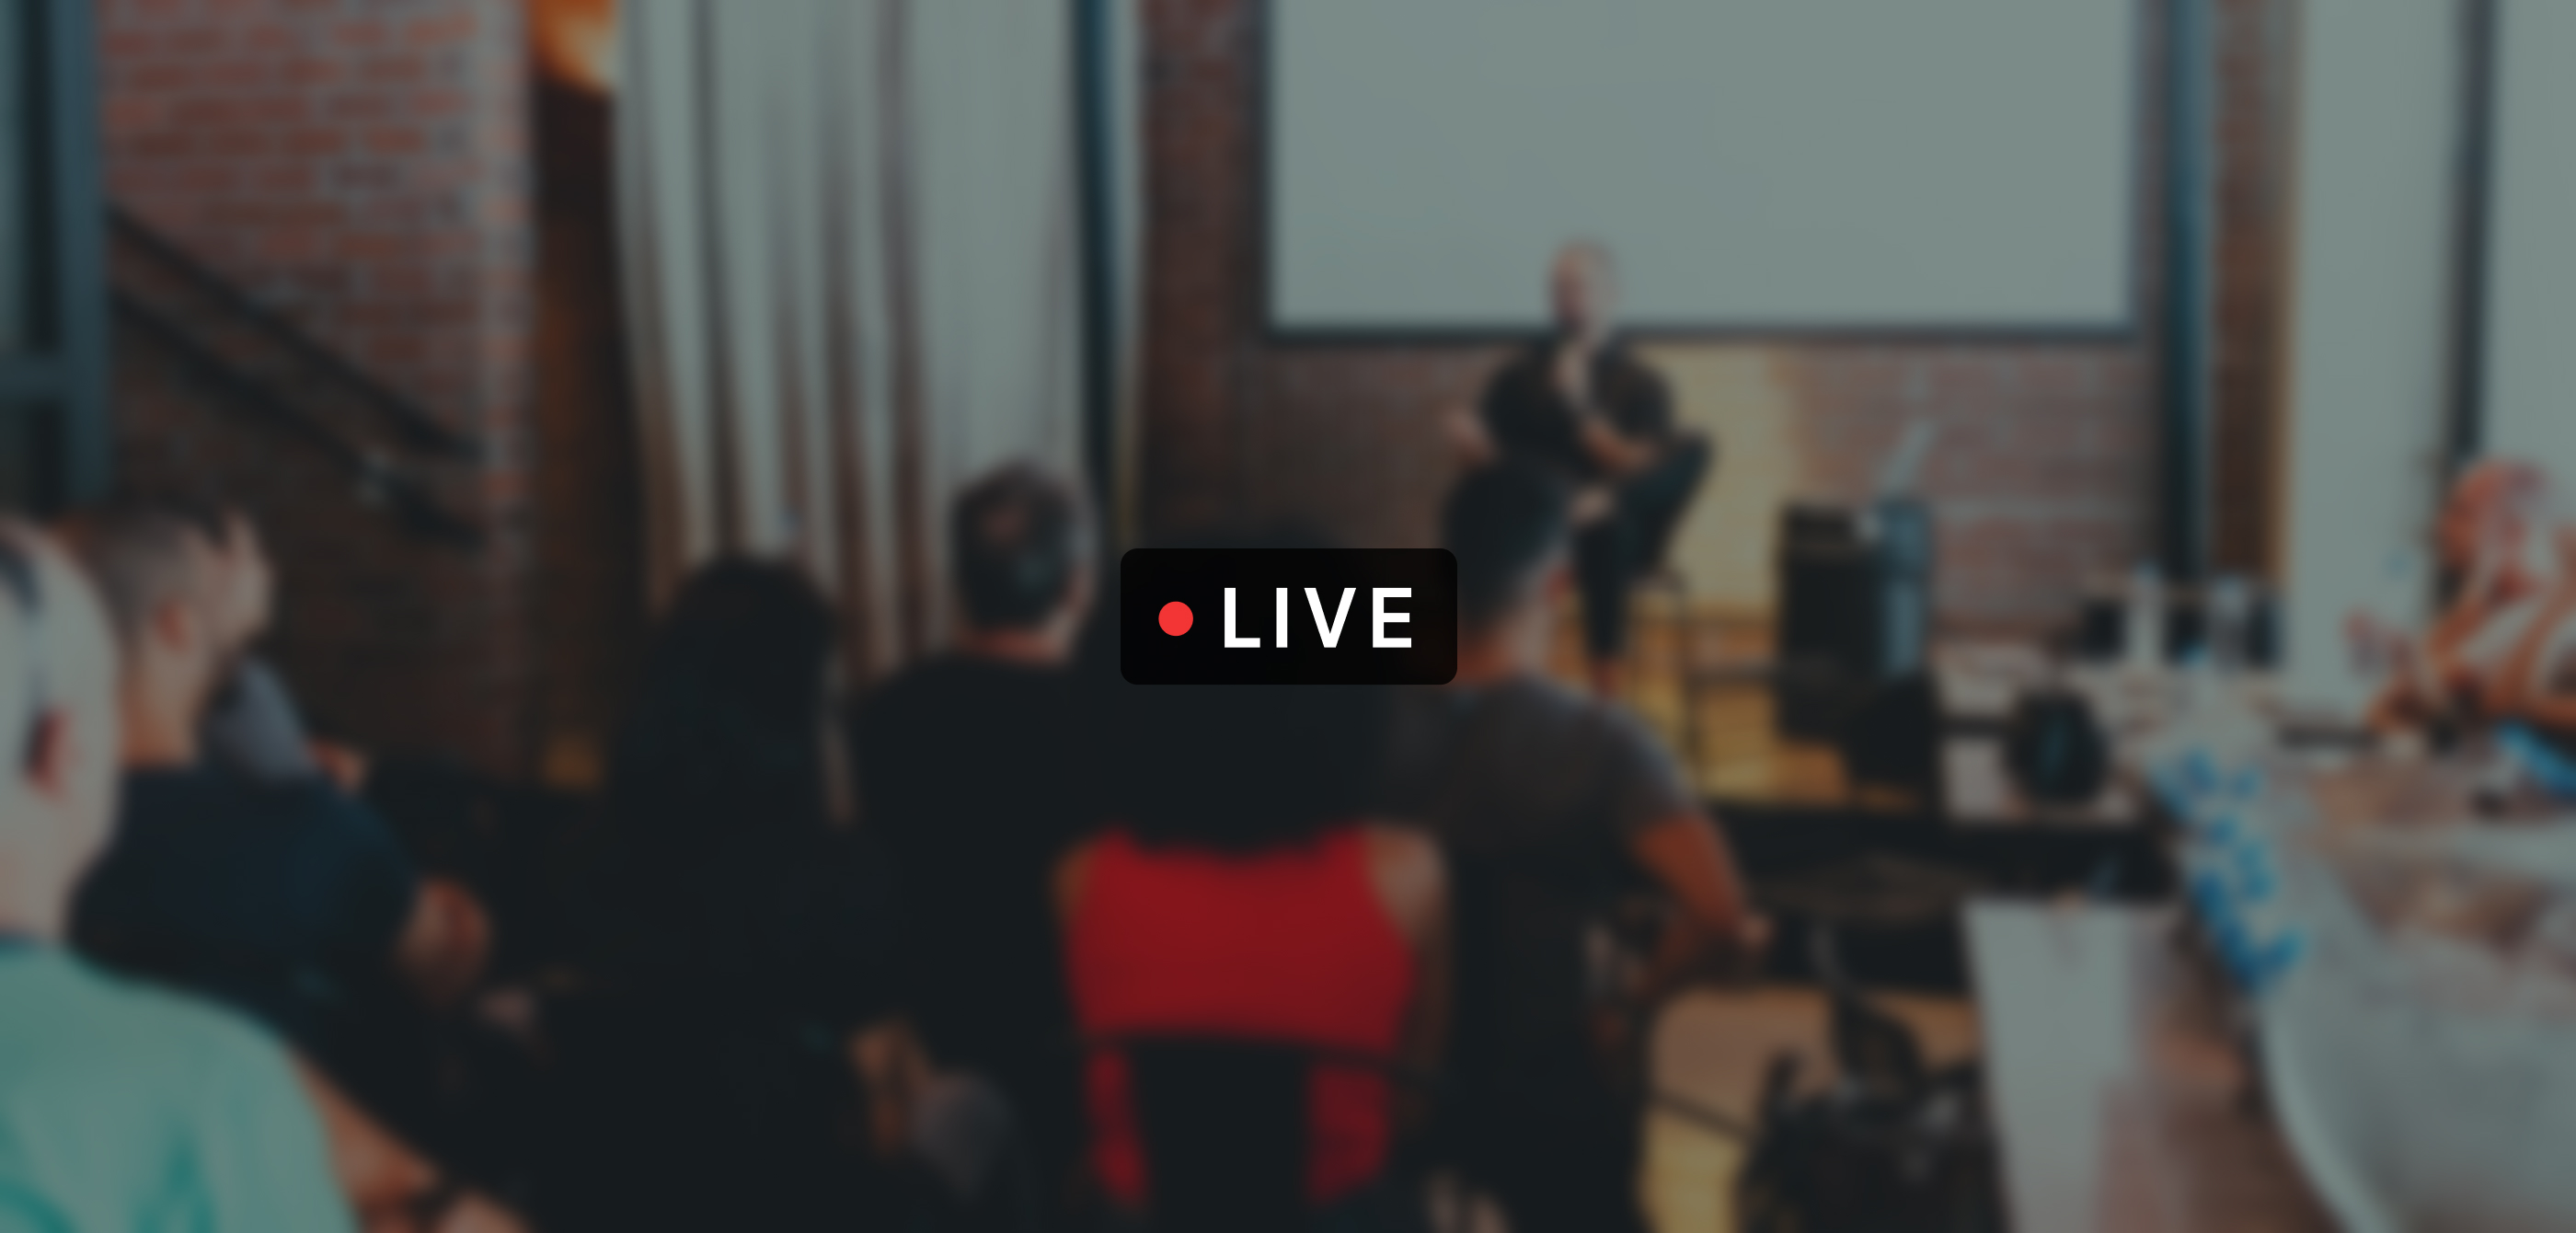 15 Live-Stream Video Statistics for Brands in 2021